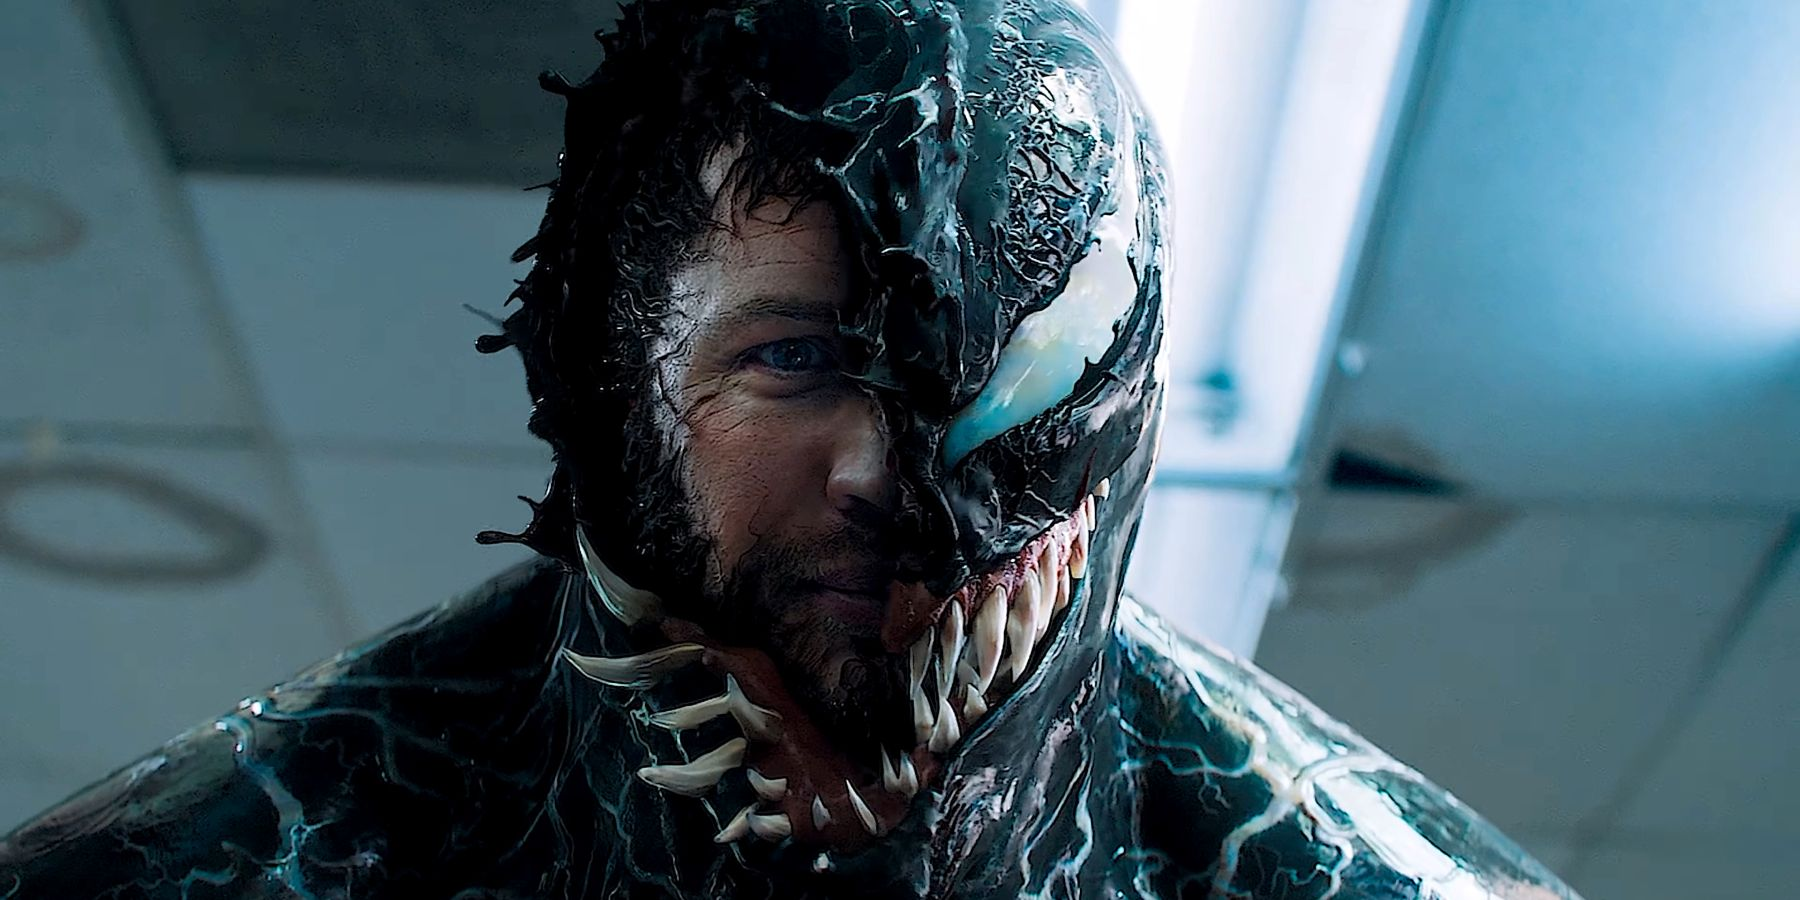 Eddie Brock (Tom Hardy) - Venom : Let There Be Carnage